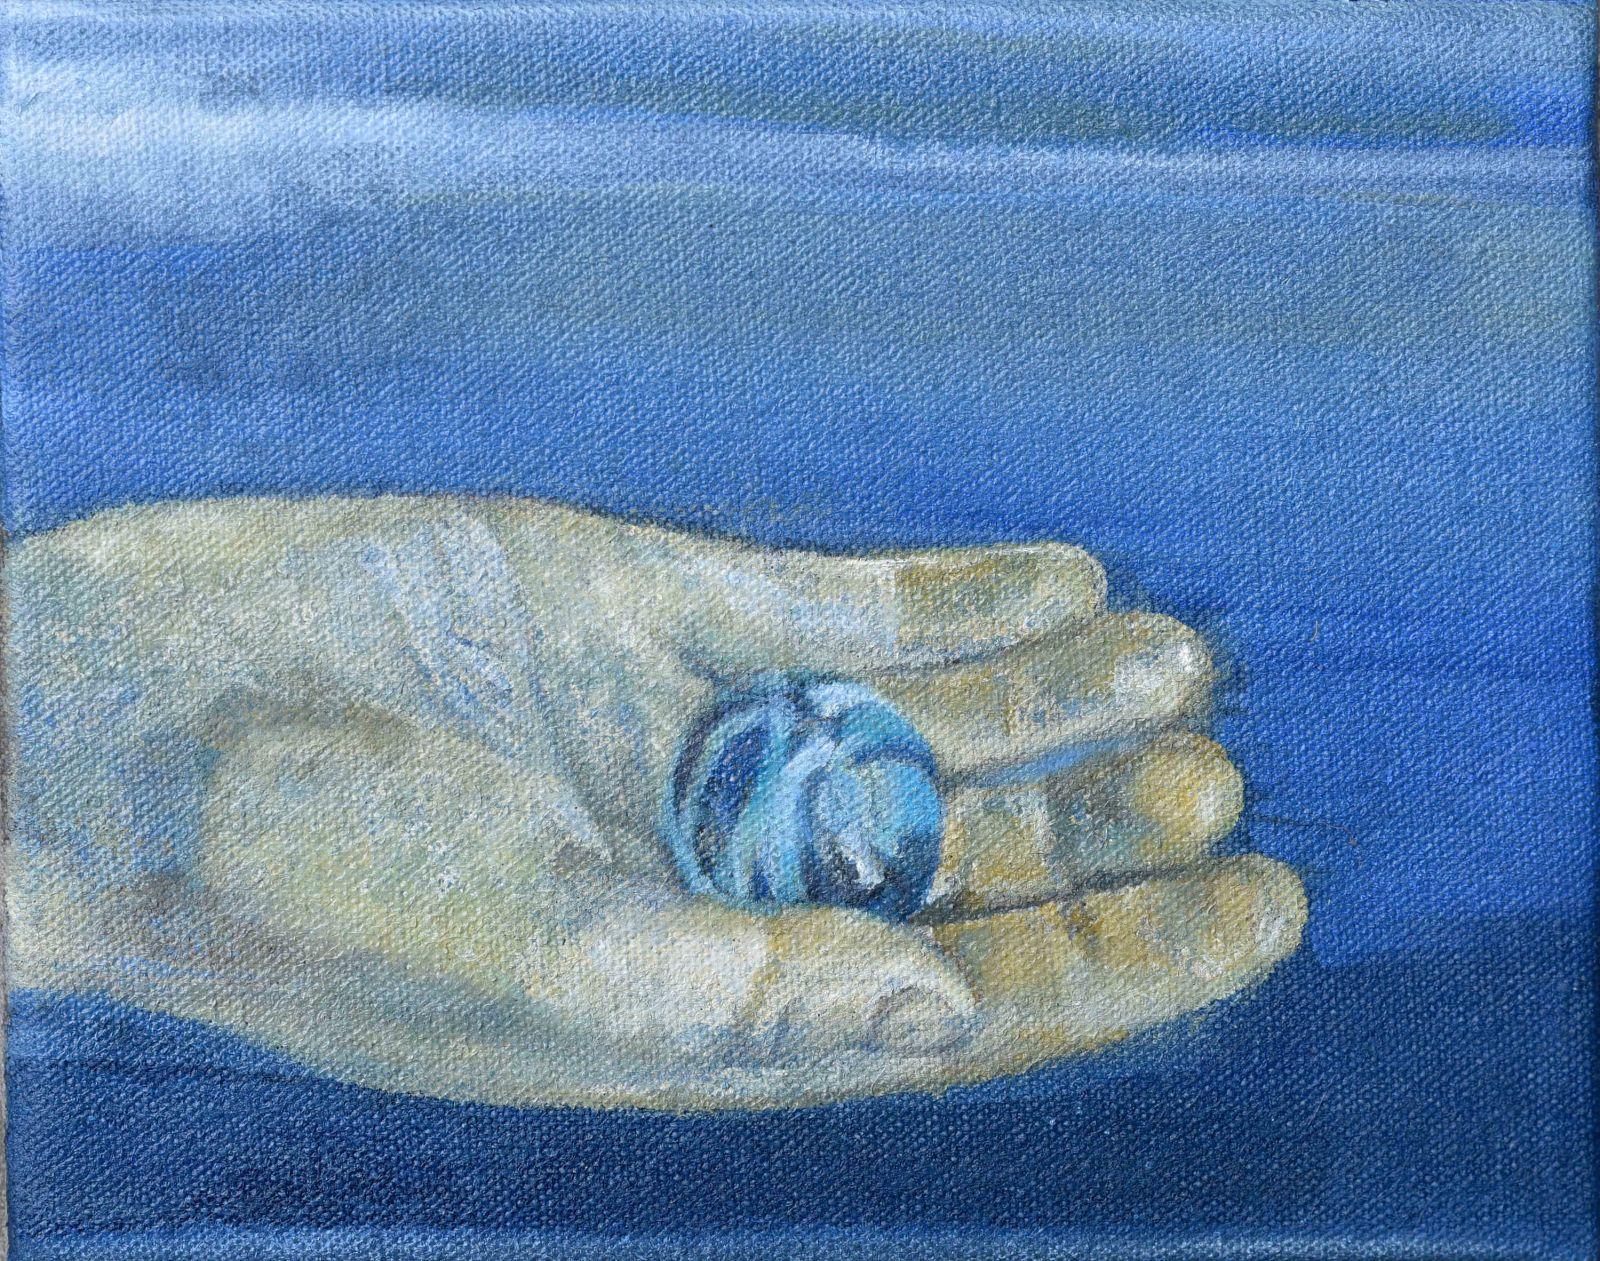 il-main-bleue-bille_huile-sur-toile_14x18-cm_2018-4c0cdfb620045bfe3b483d75fa0fd96b